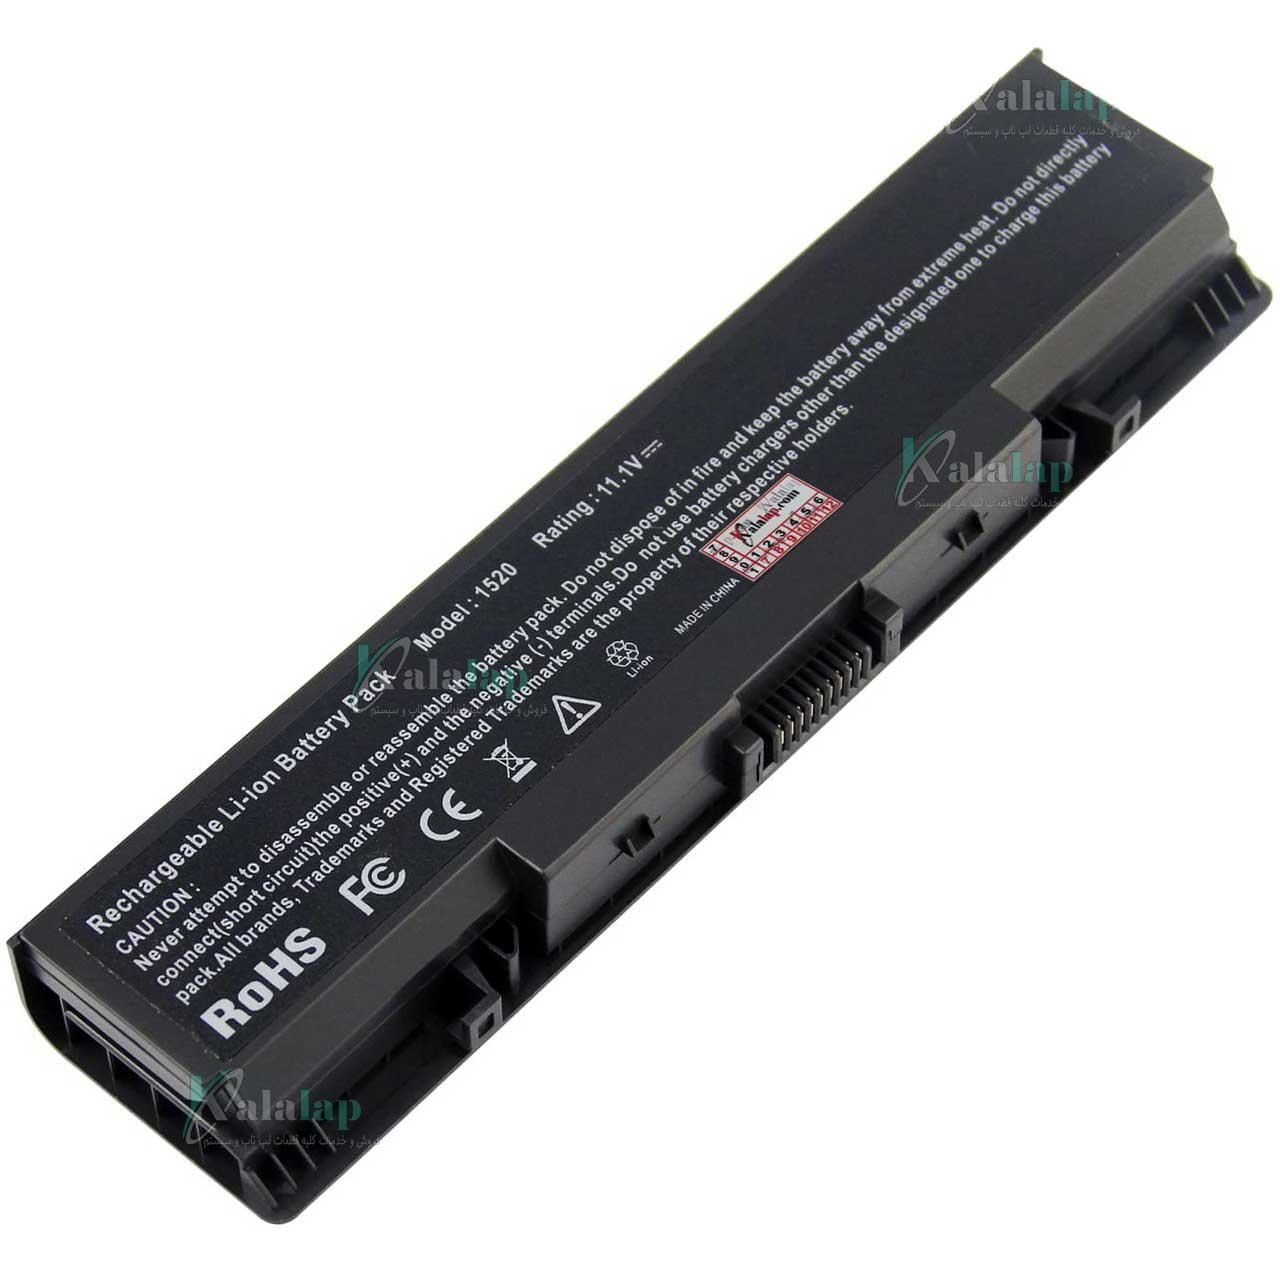 باتری لپ تاپ دل 1520 Battery Dell Inspiron